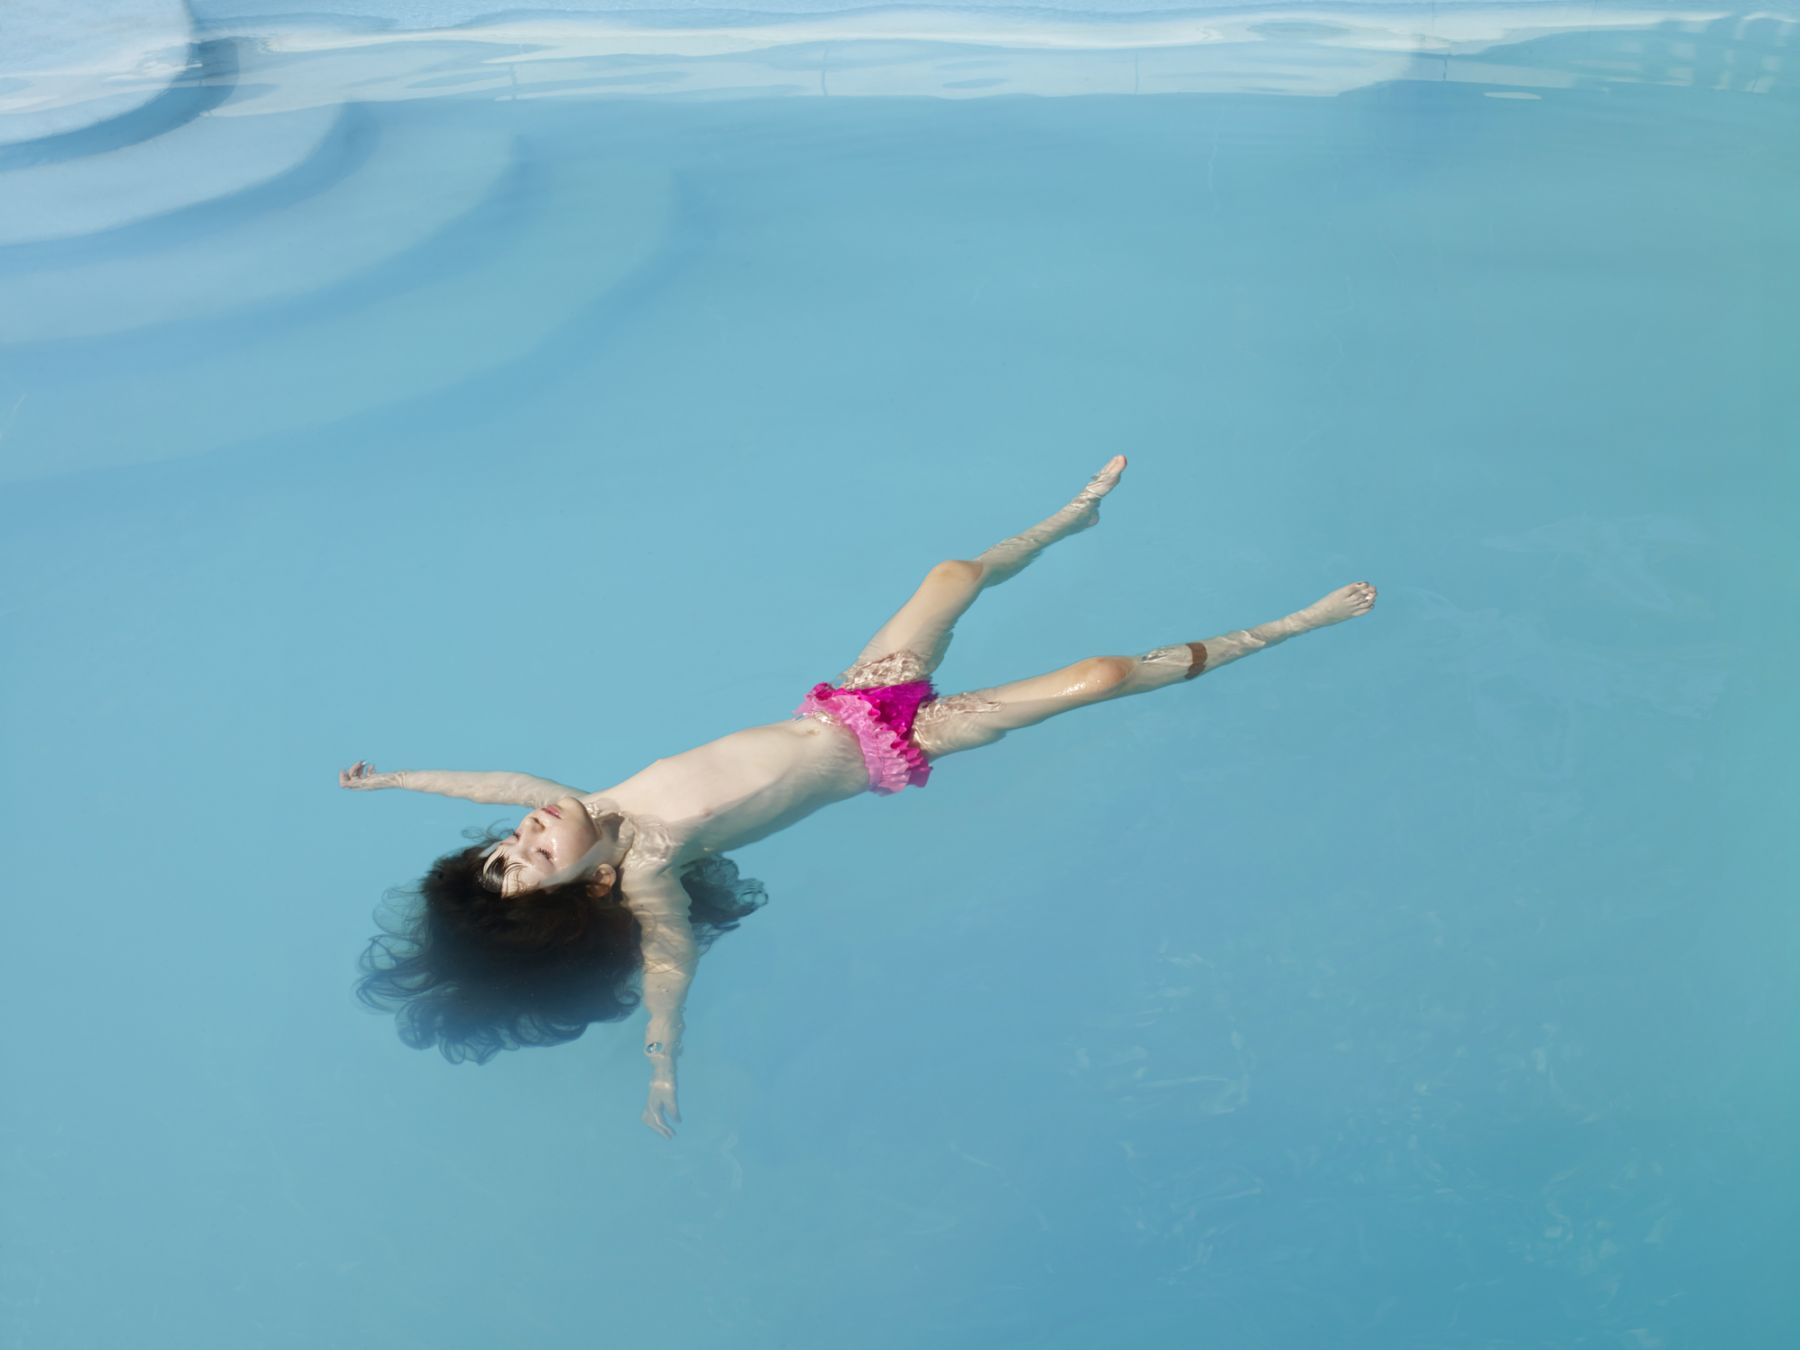 ANGELA STRASSHEIM Untitled (Jessica Floating), 2013